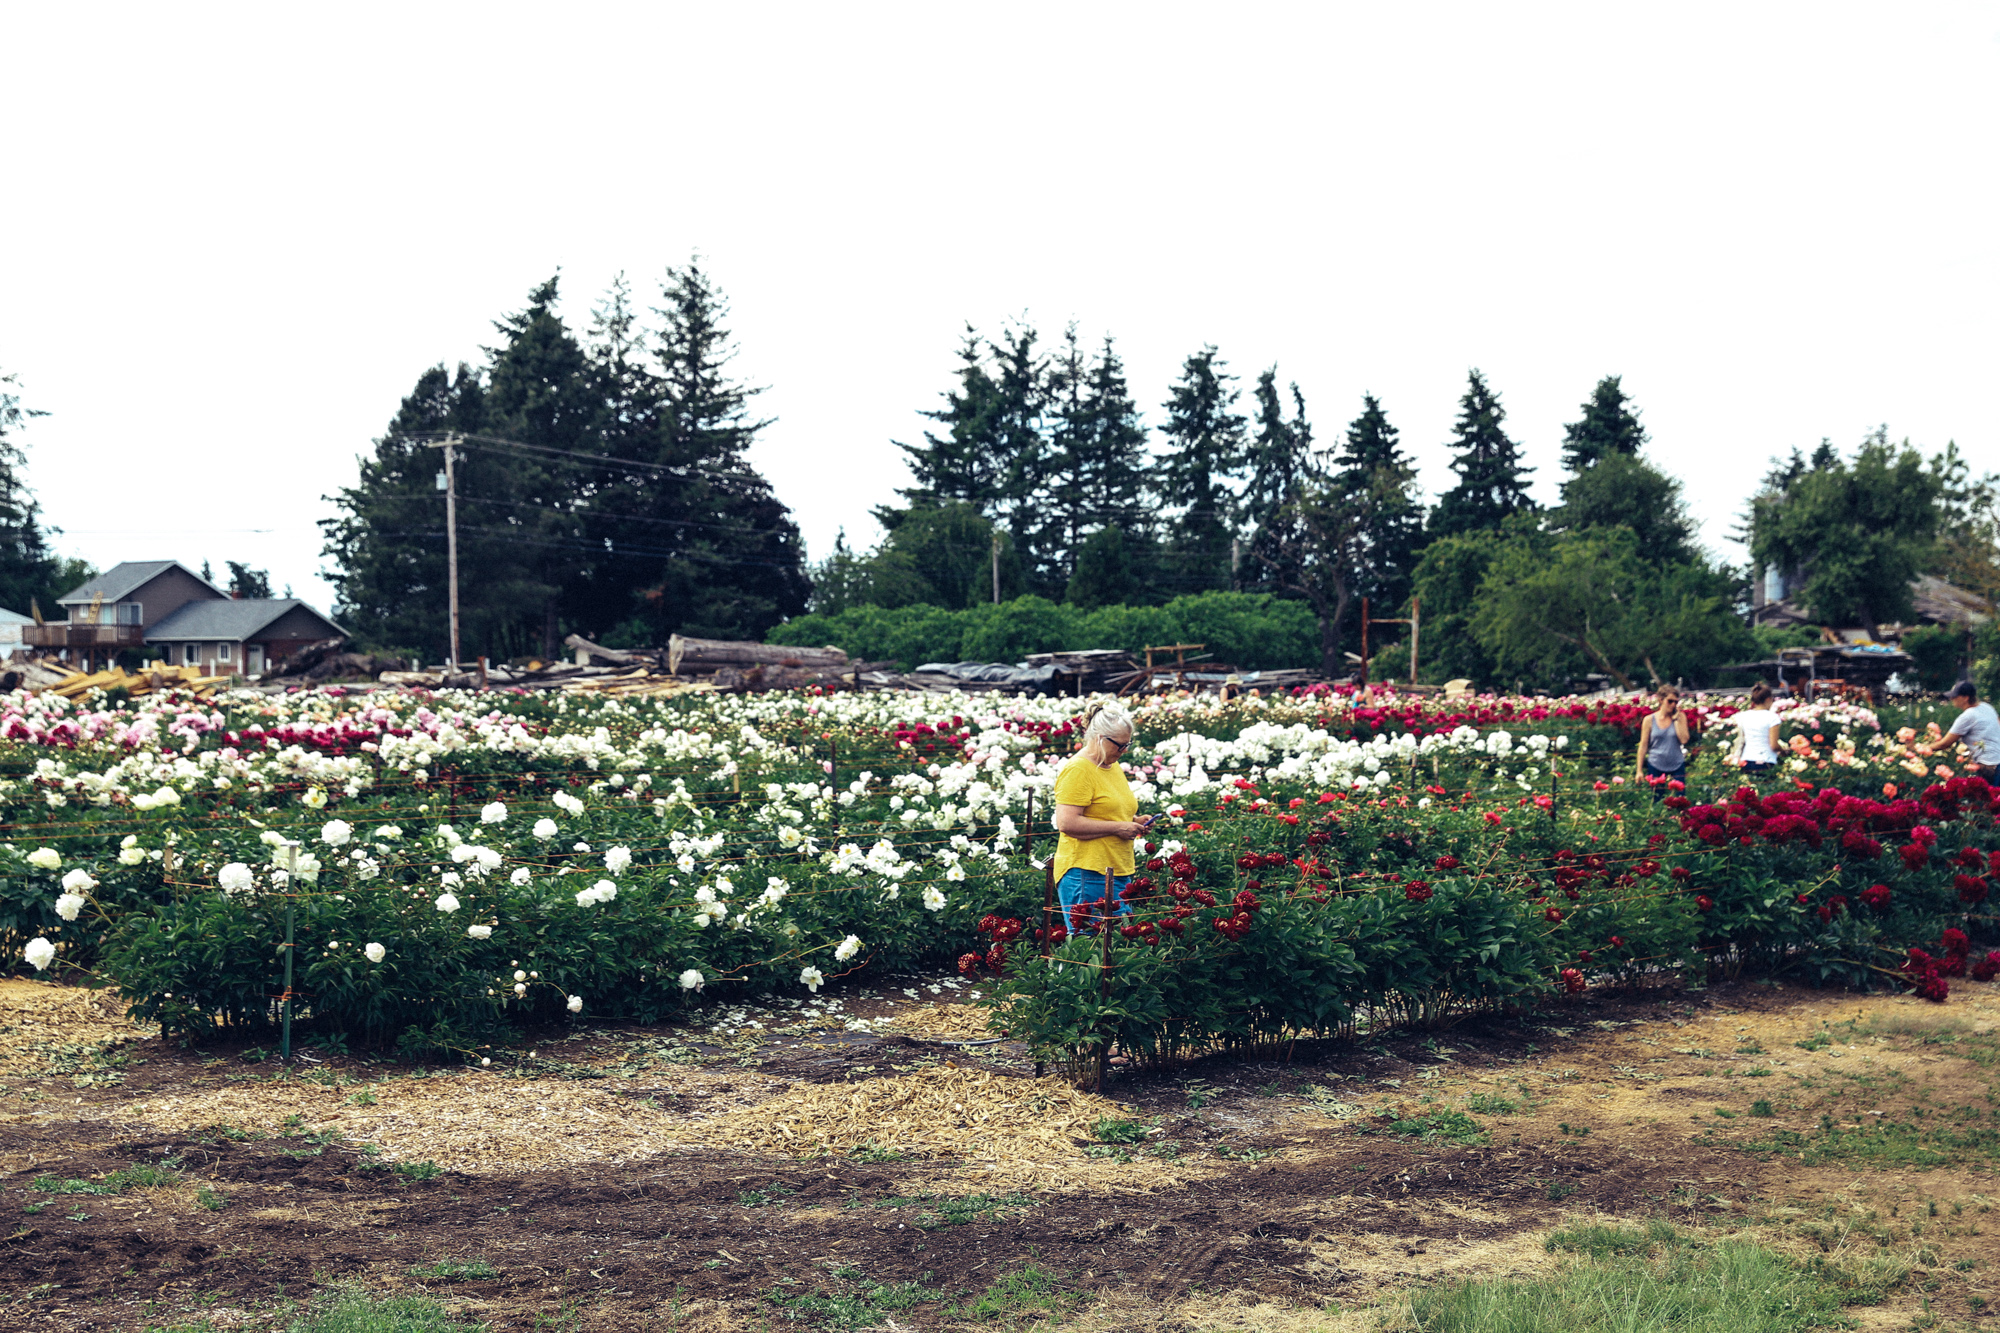 PNW Peony Farm - Oh Flora Travels-1.jpg